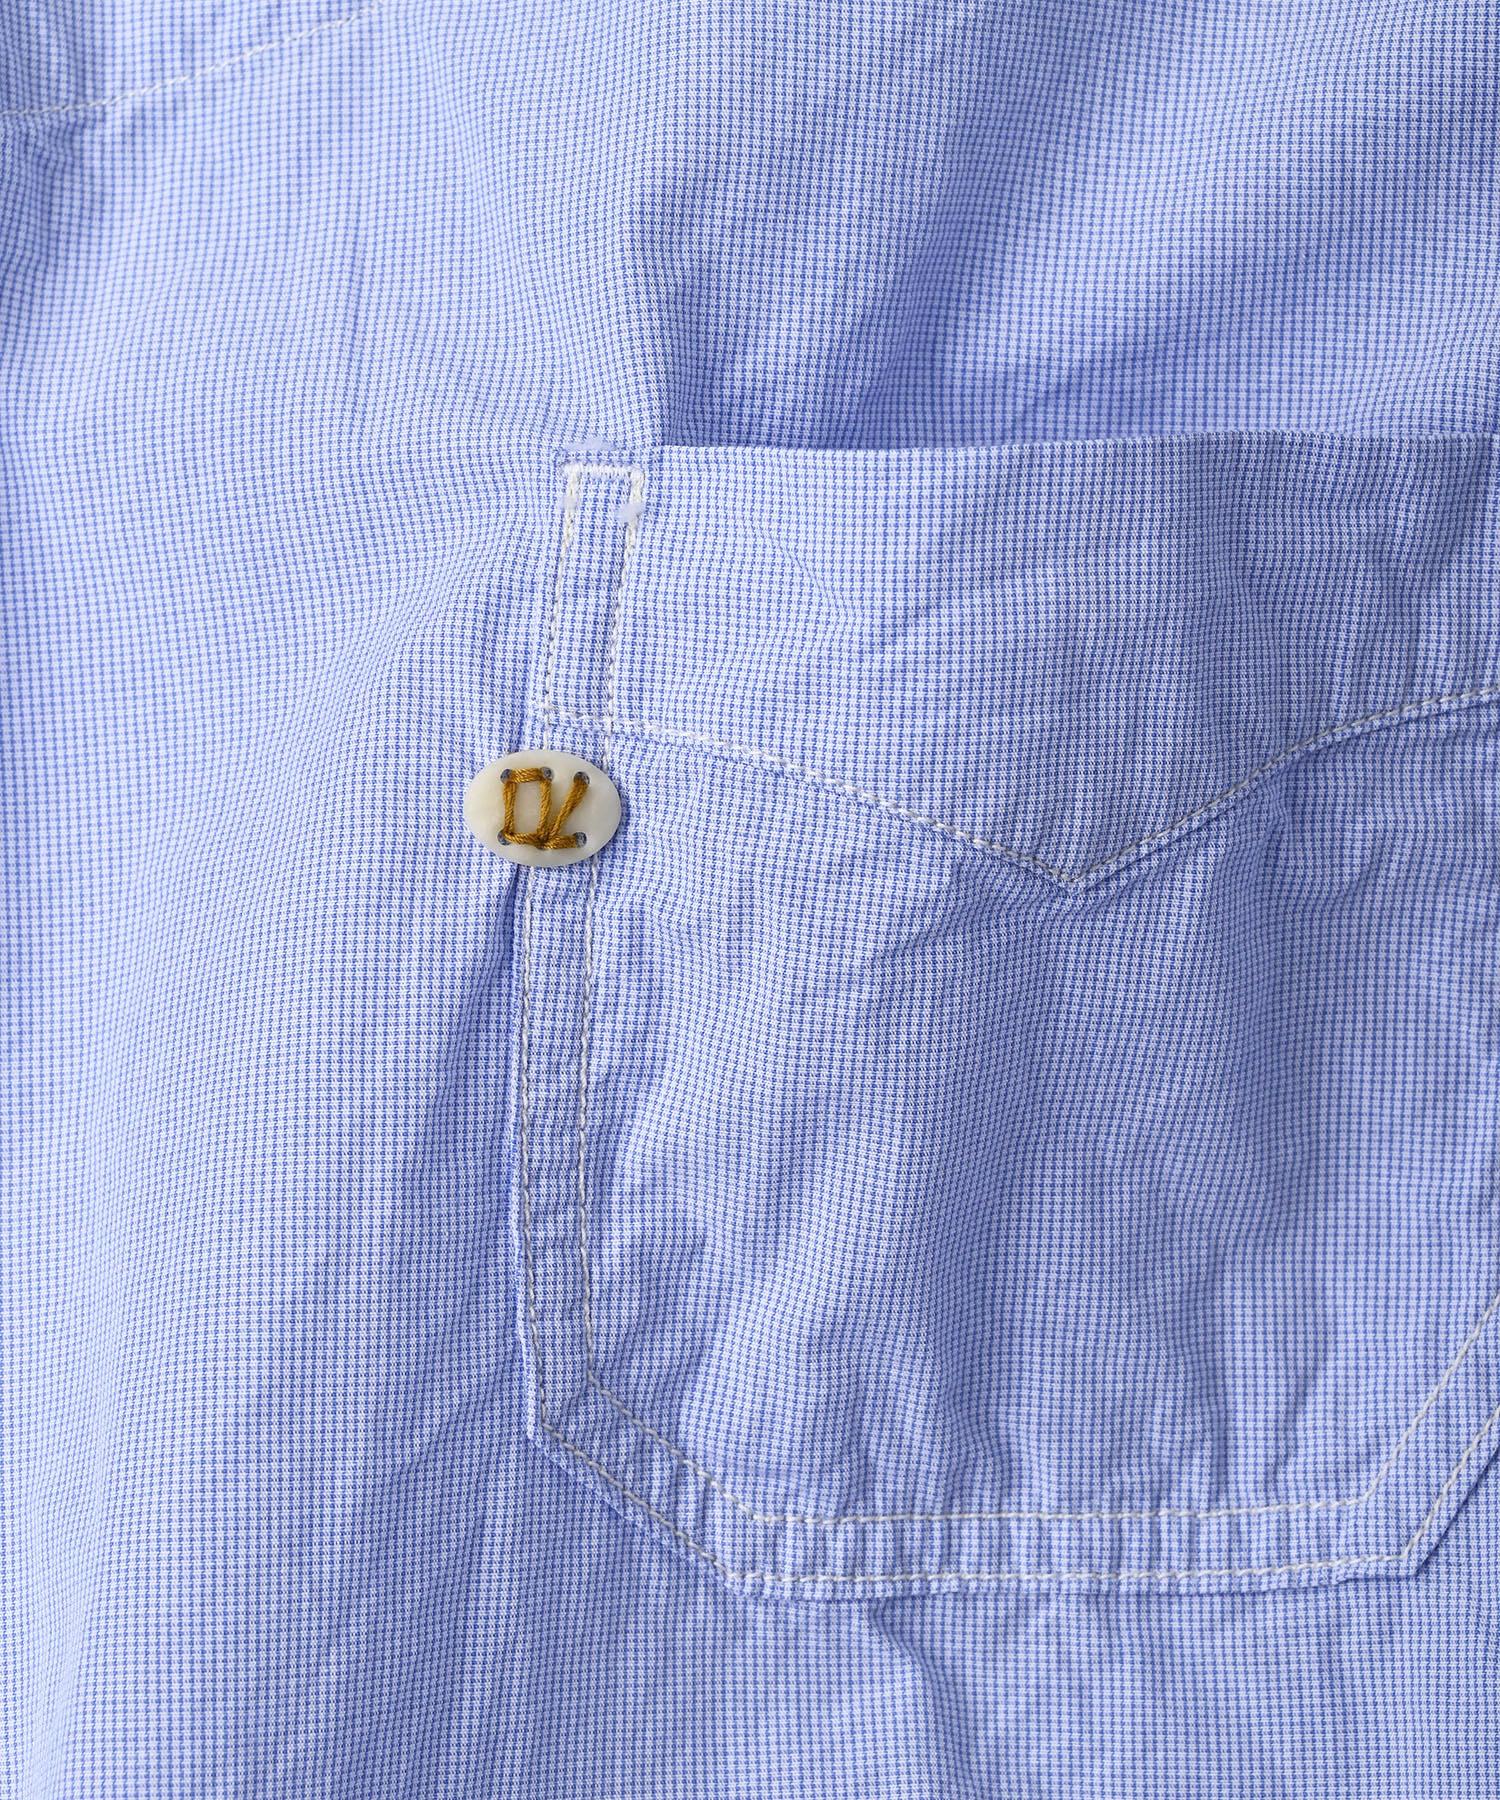 Damp Yarn Dyed 908 Ocean Pullover Shirt (0421)-11